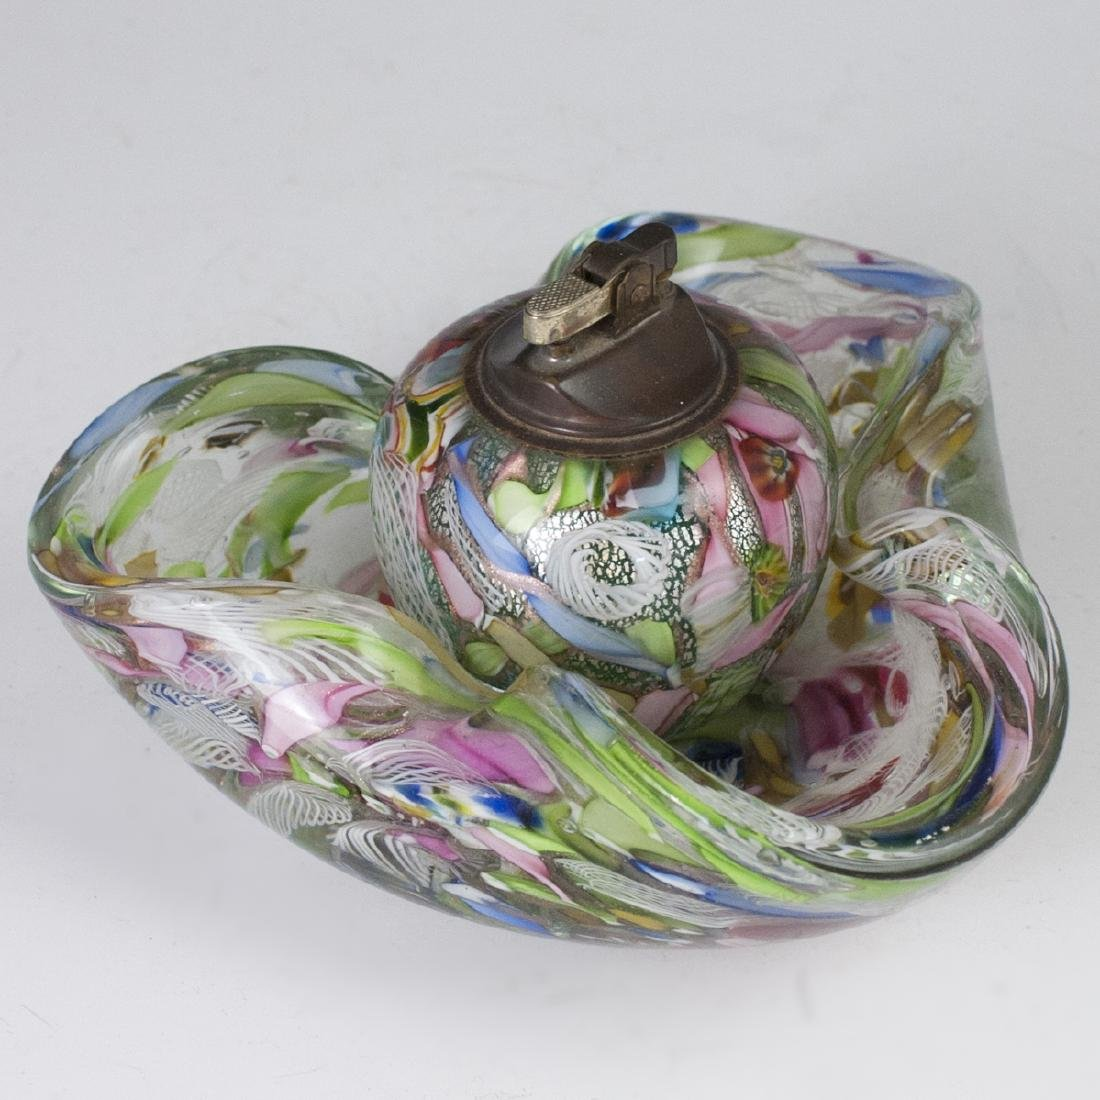 Dino Martens AVEM  Zanfirico Murano Glass Smoker Set